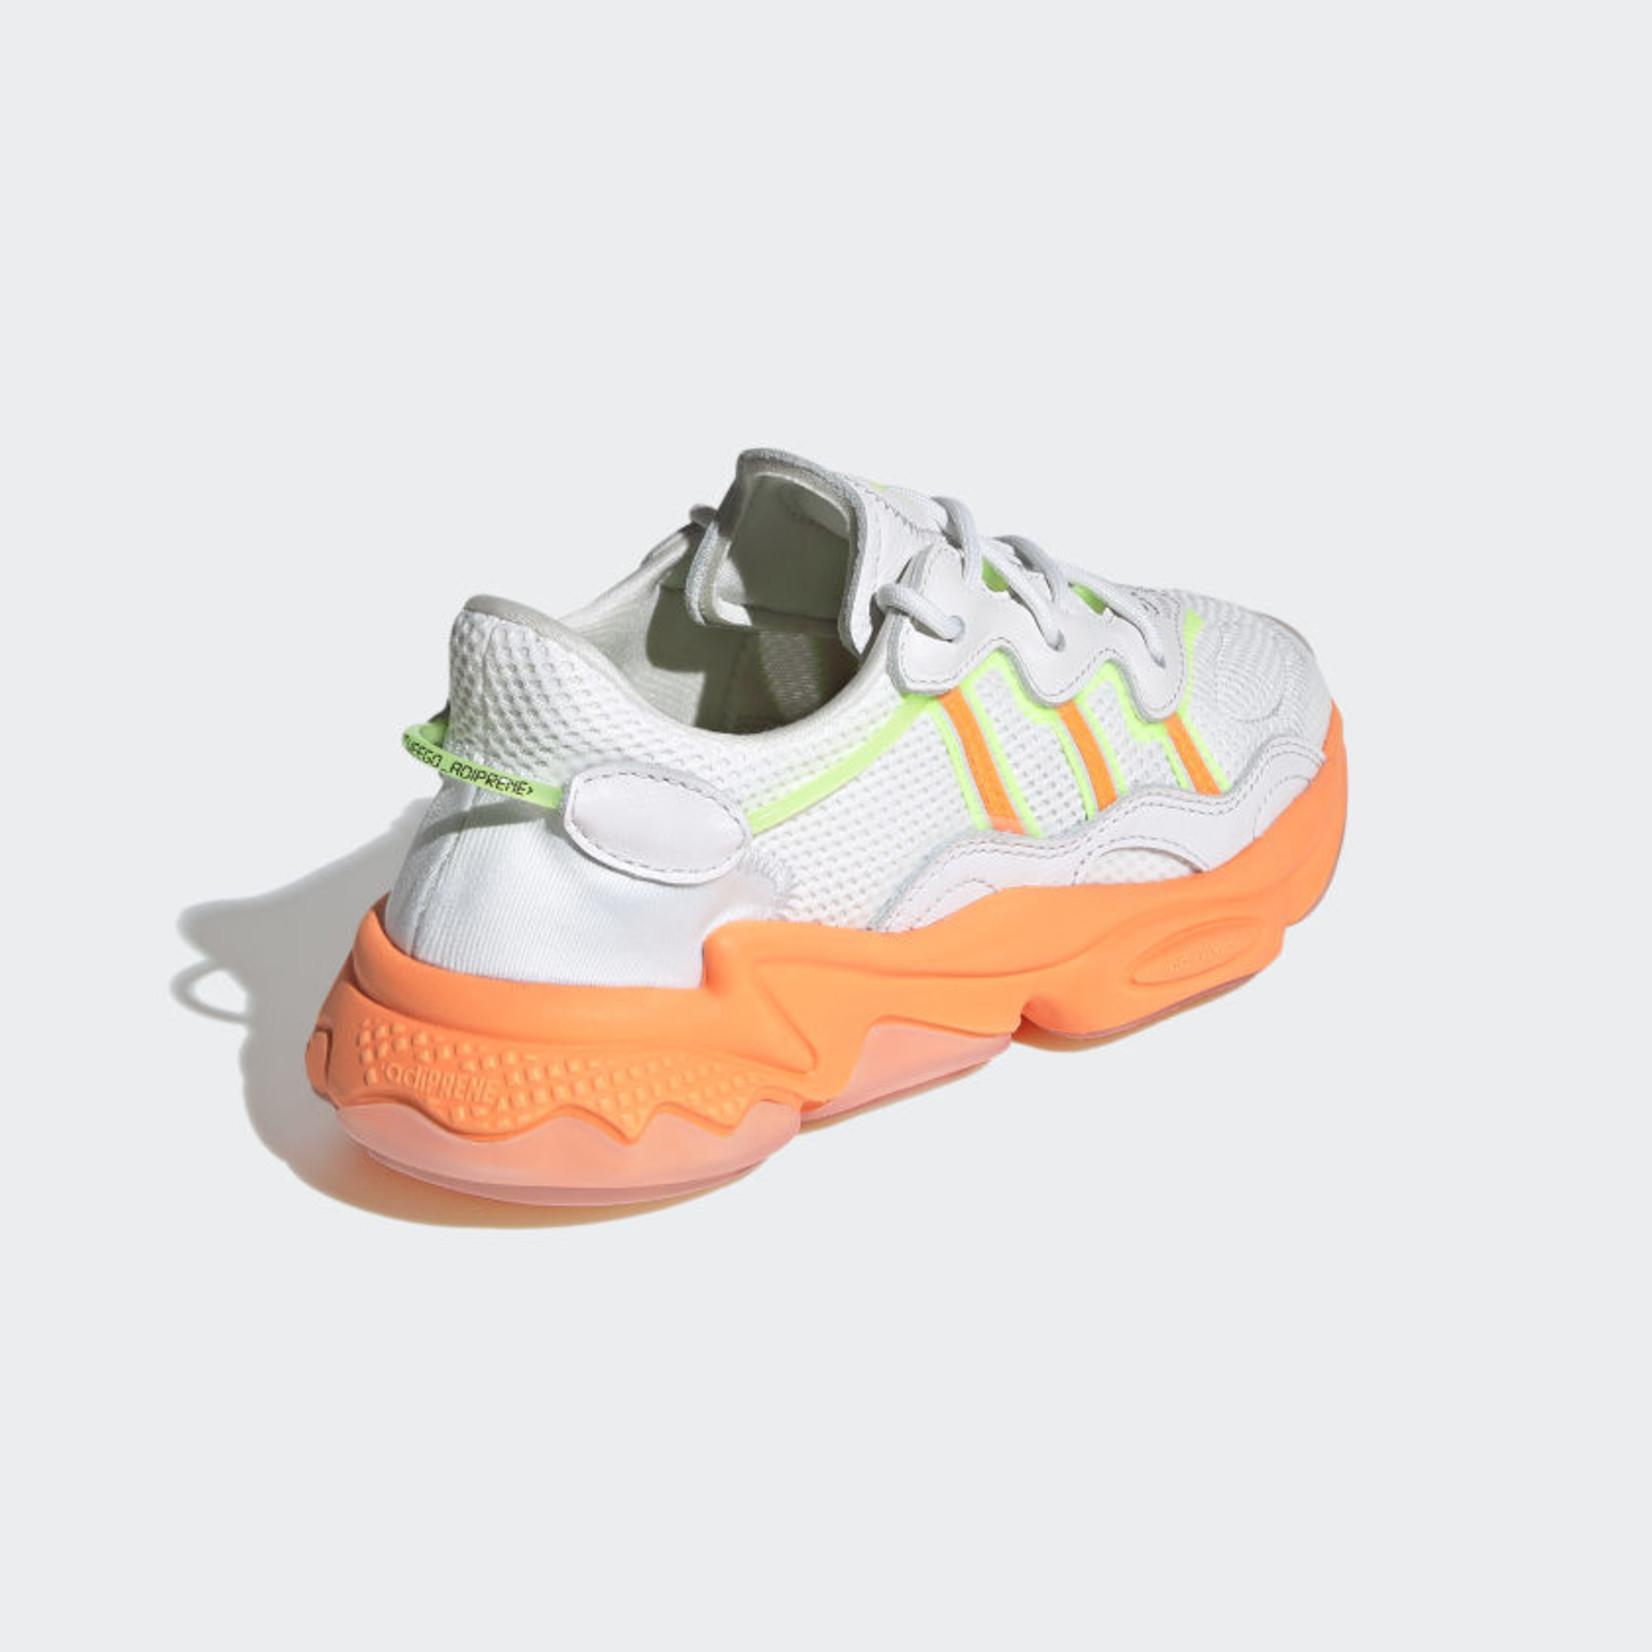 Adidas Ozweego W Crywht/Sigorg